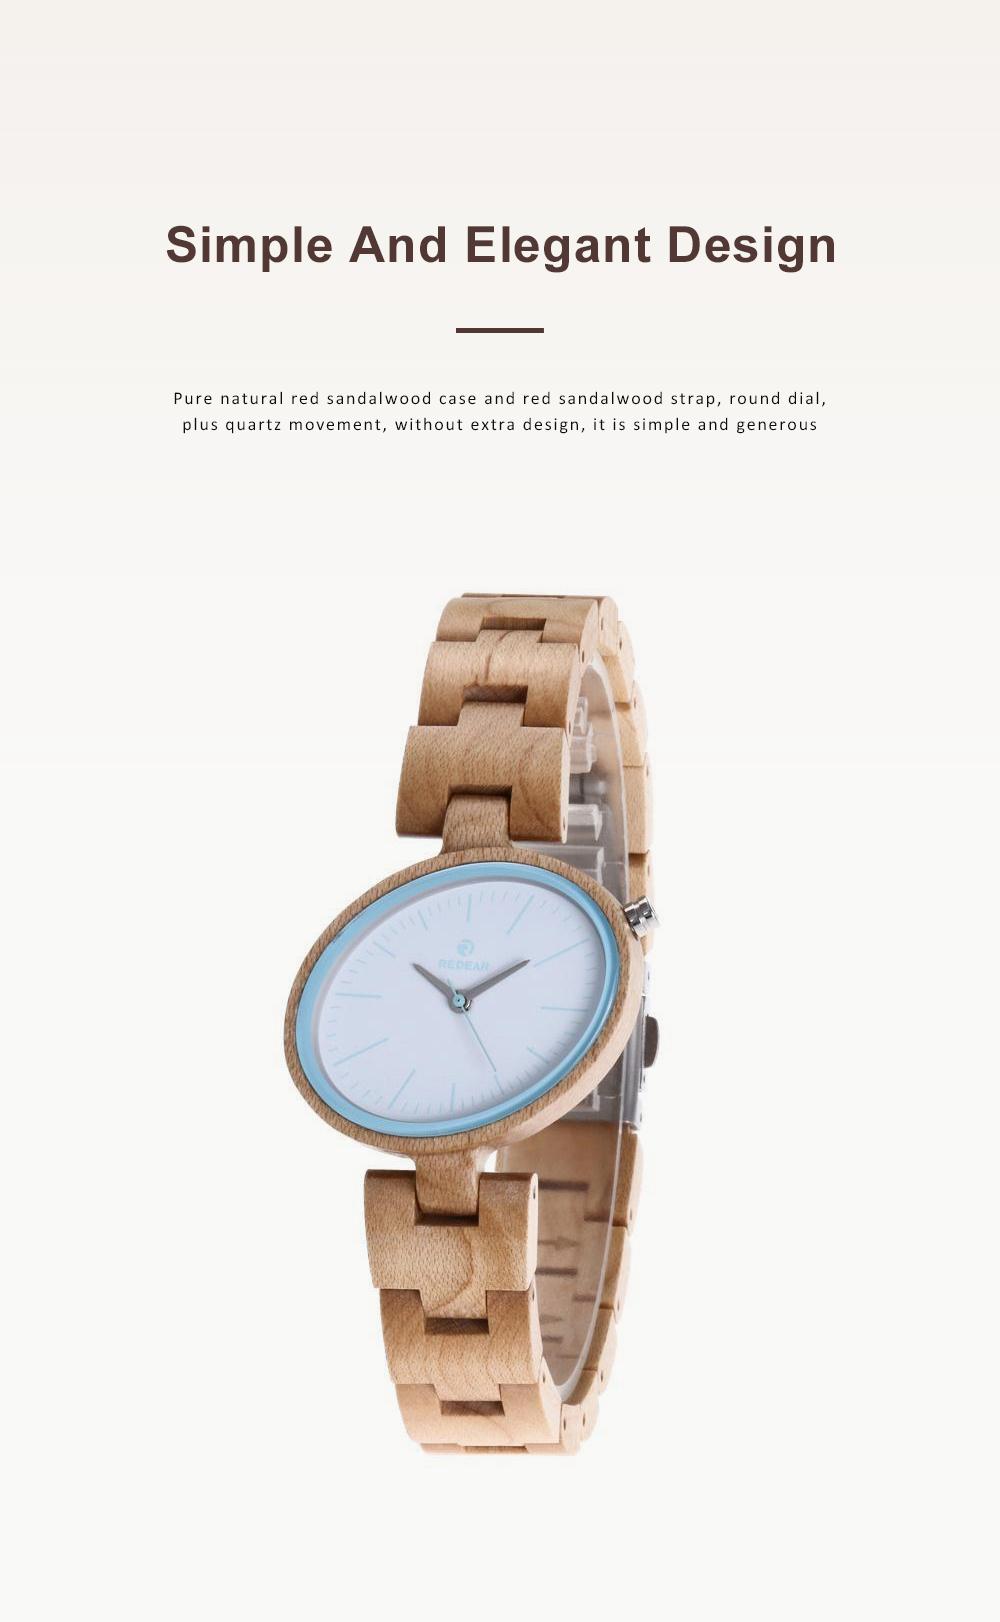 Women Watches Elegant Wood Band Stainless Steel Quartz Wrist Bamboo Watch With Waterproof Wristwatch For Ladies Girls 4